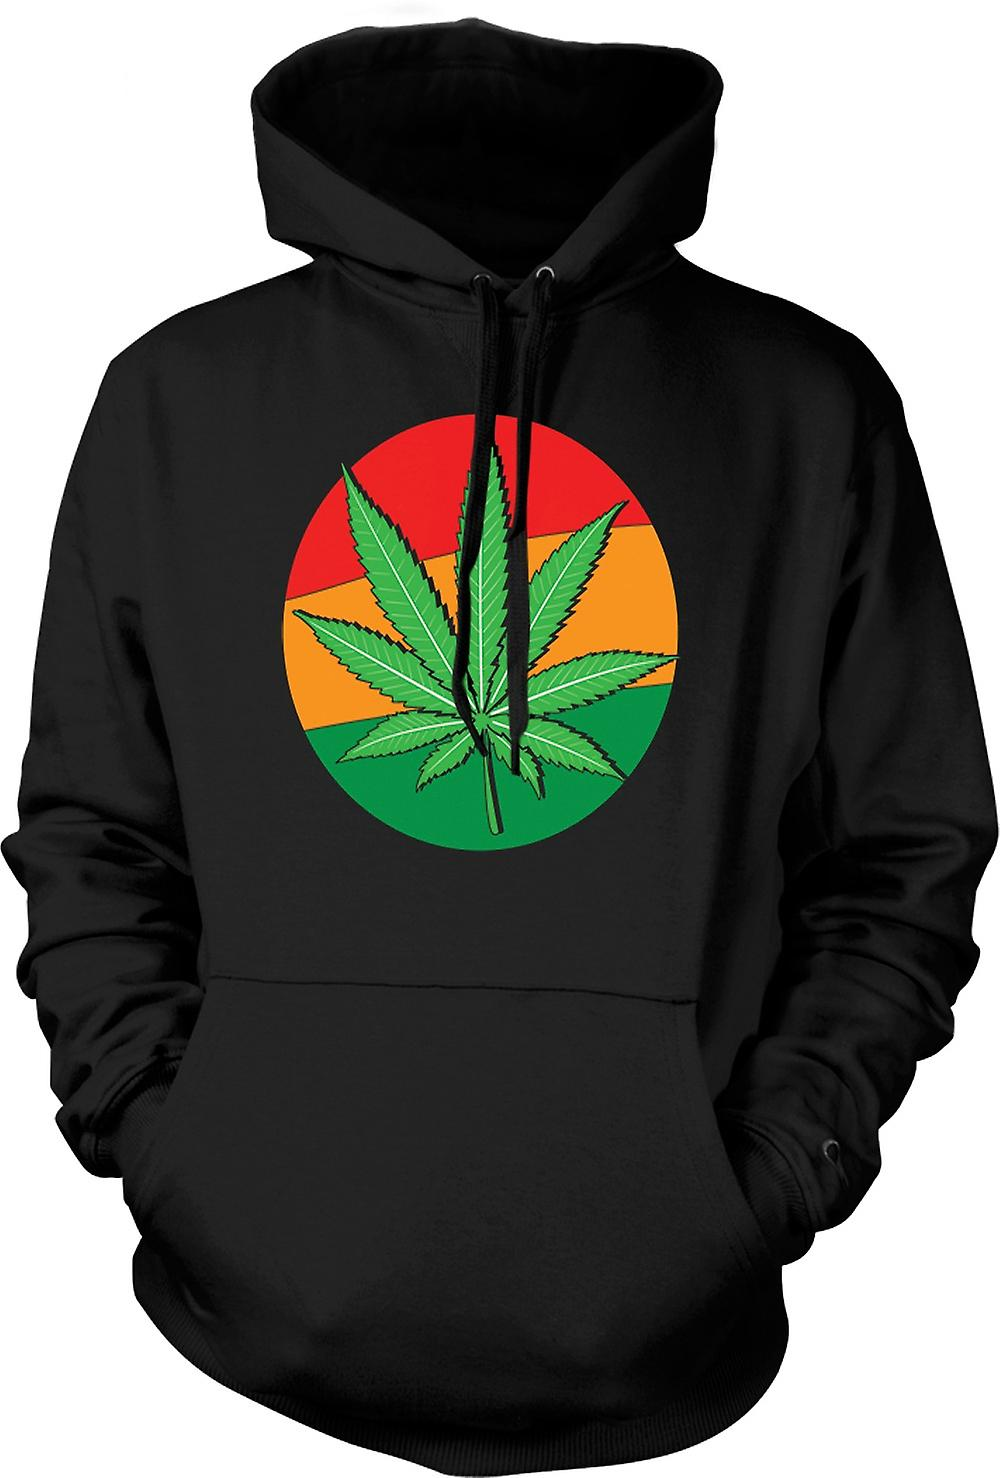 Mens Hoodie - Hash Leaf Jamaica flagga - Cool